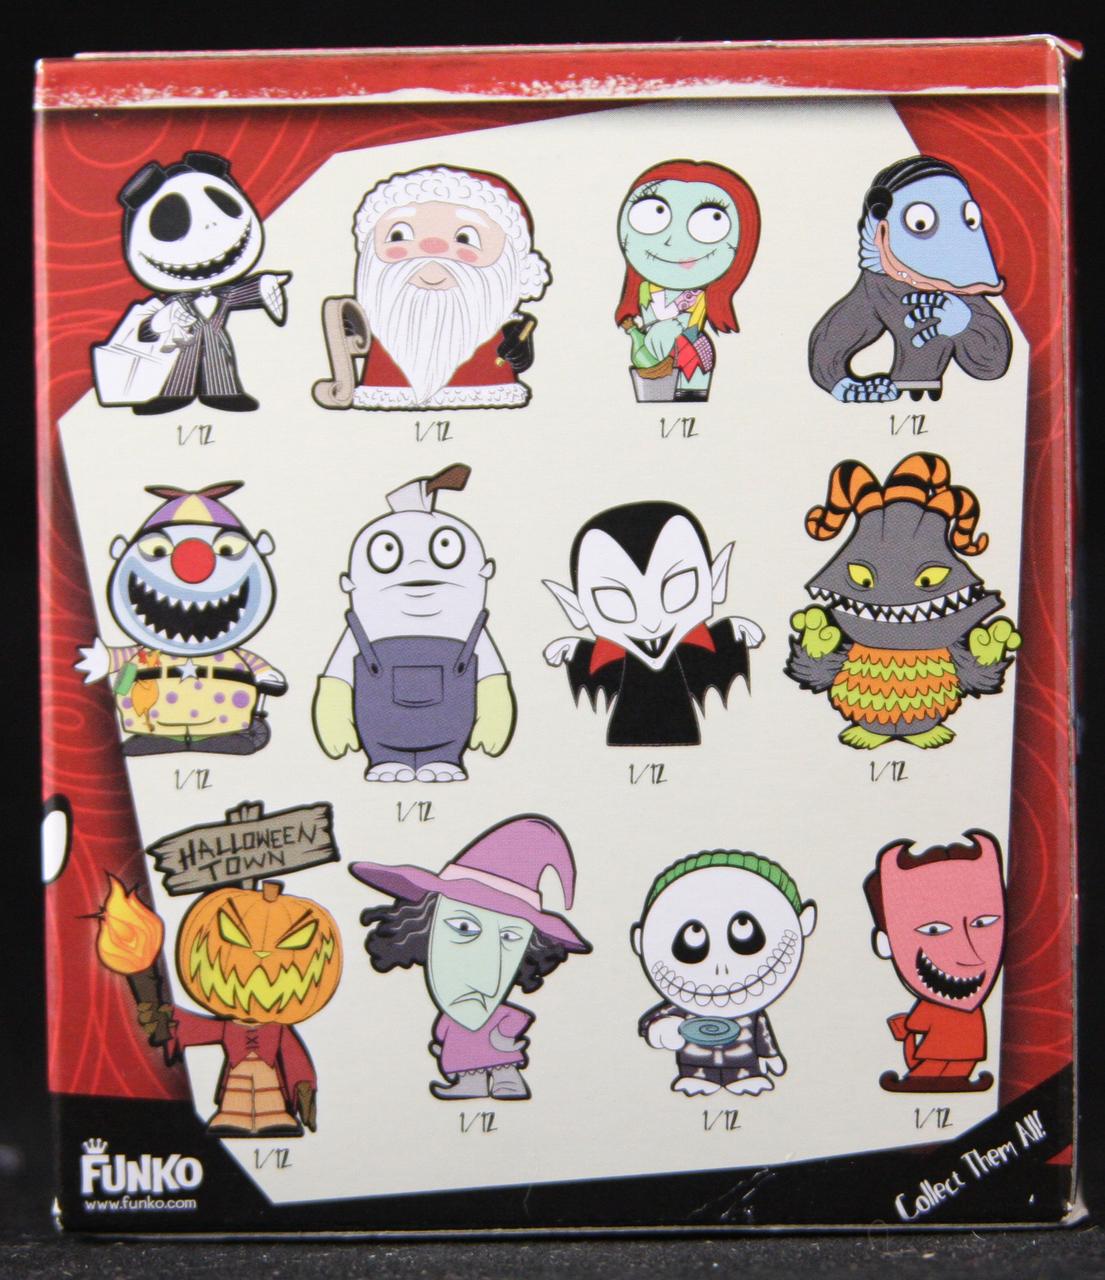 Nightmare Before Christmas, Series 2, Mystery Mini - BlindBoxes